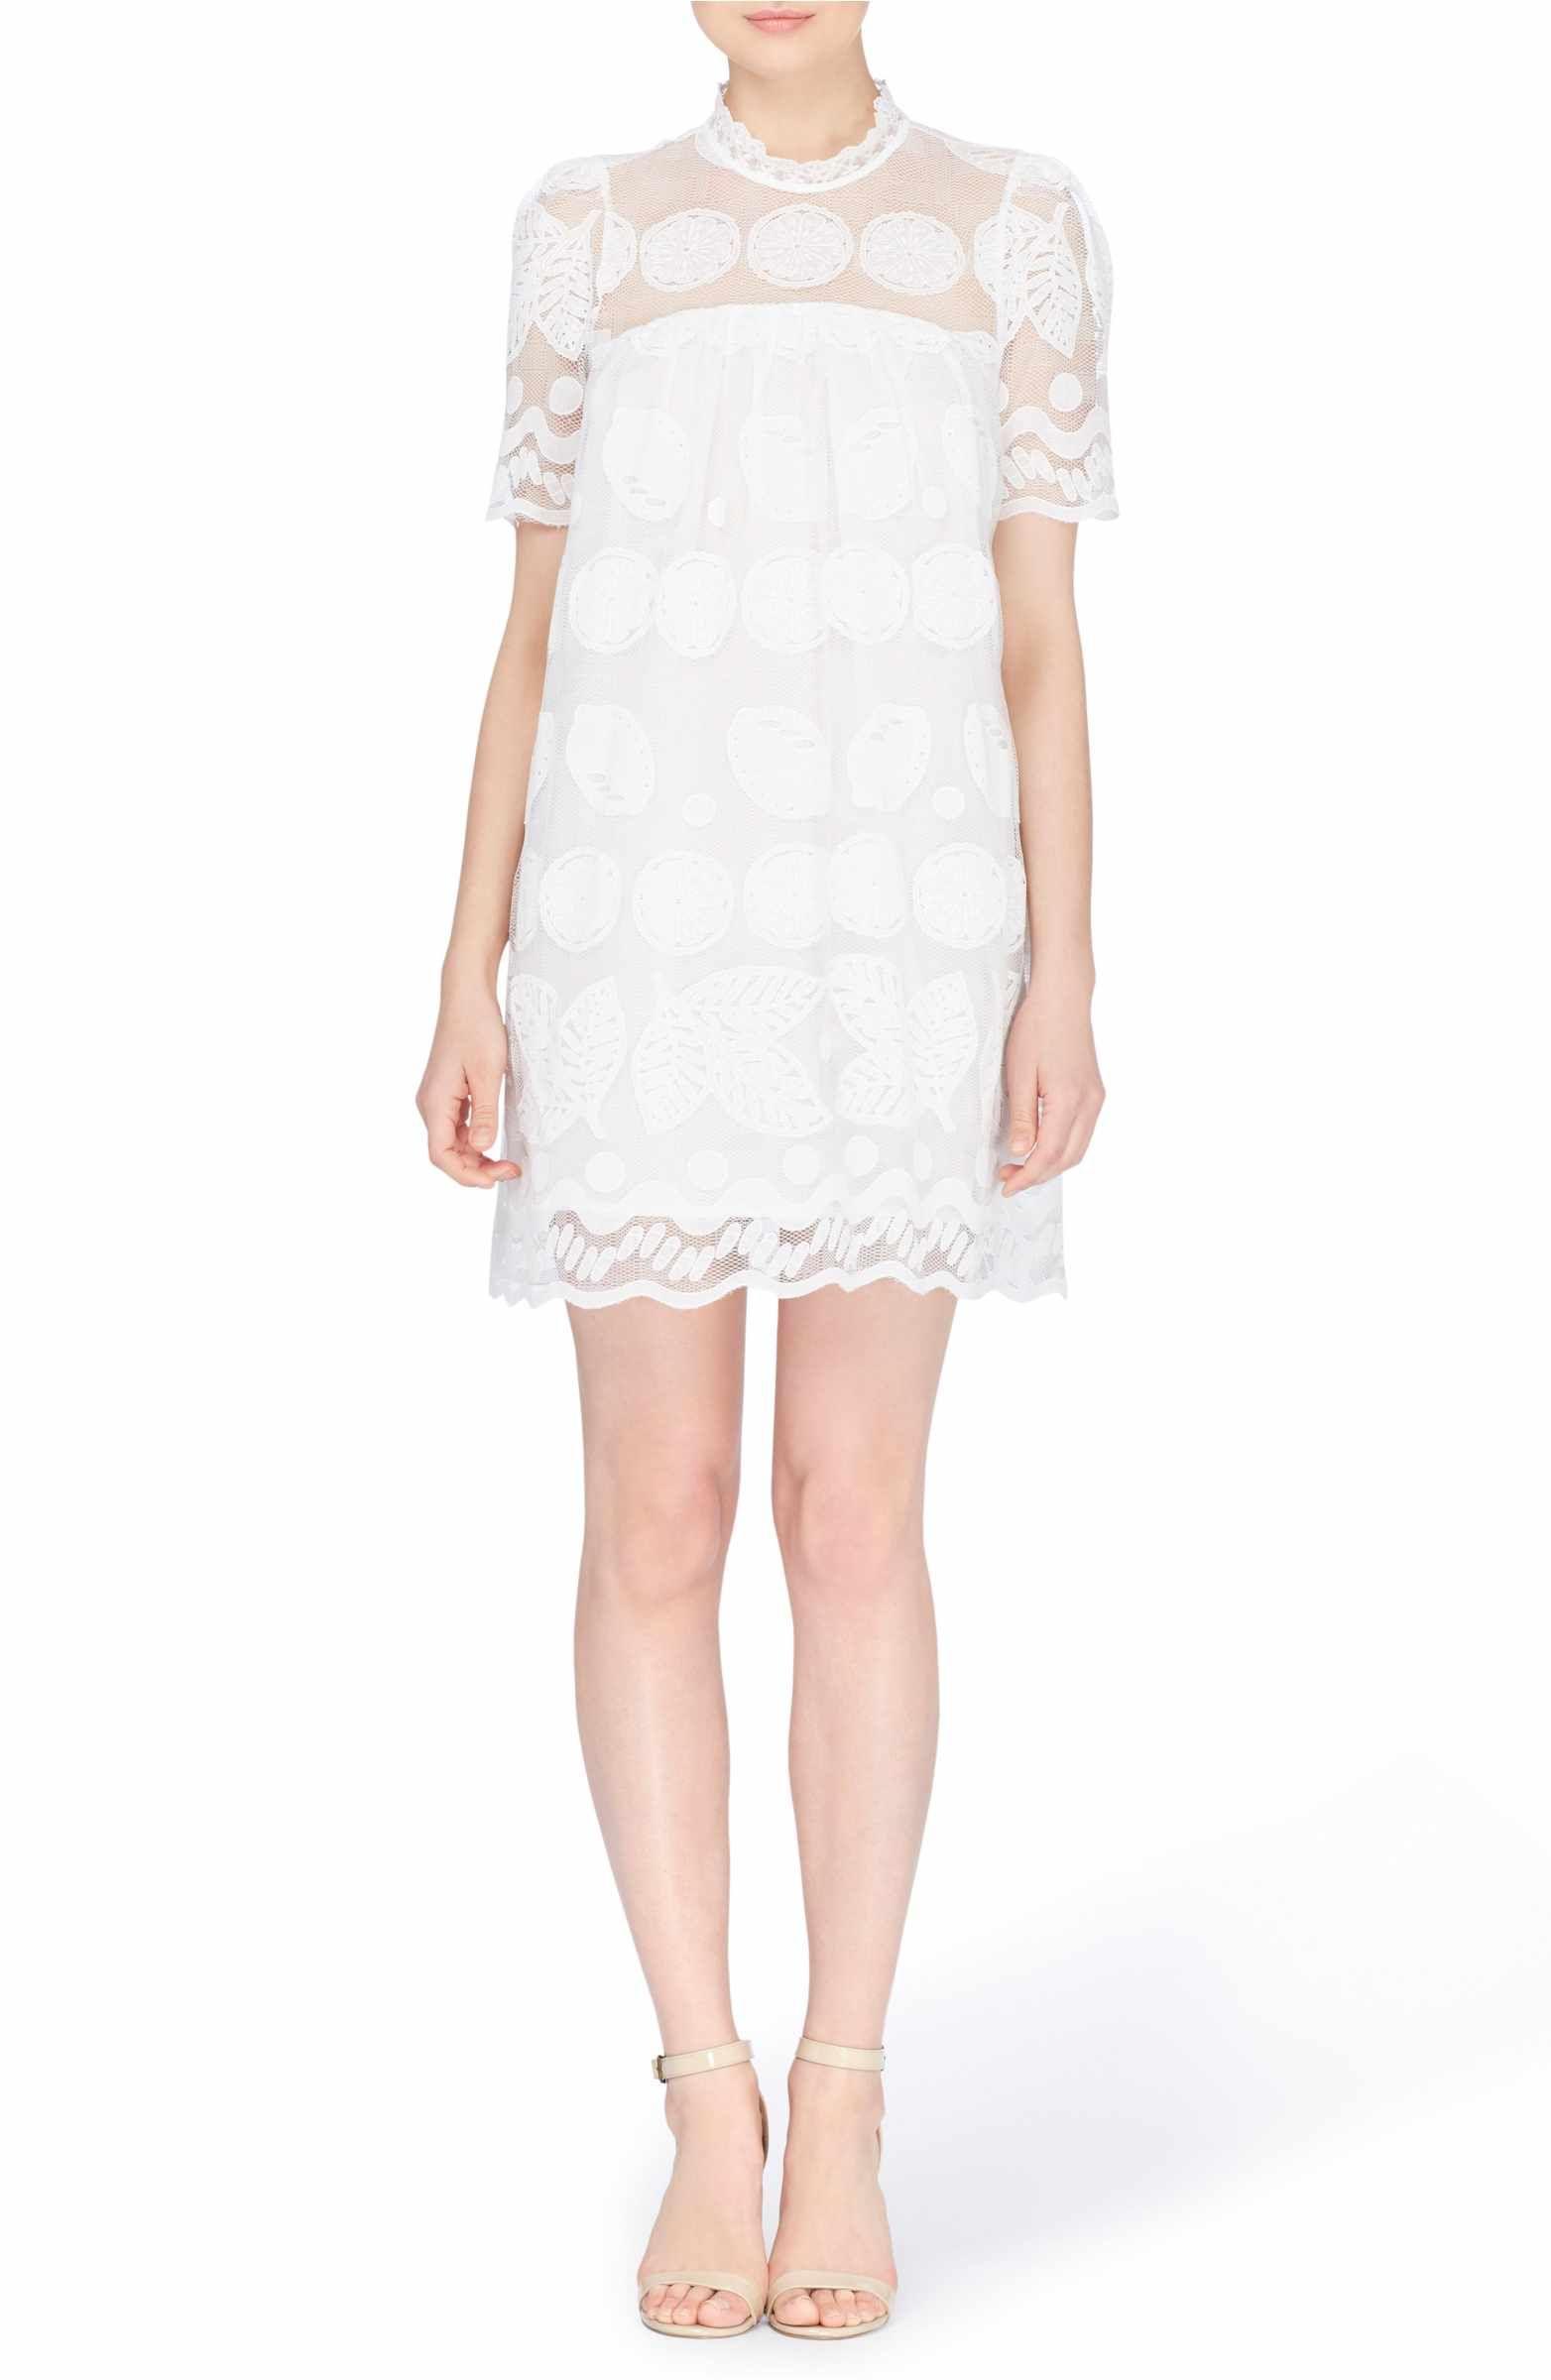 653374dda22 Main Image - Catherine Catherine Malandrino Mona Embroidered Lace Shift  Dress